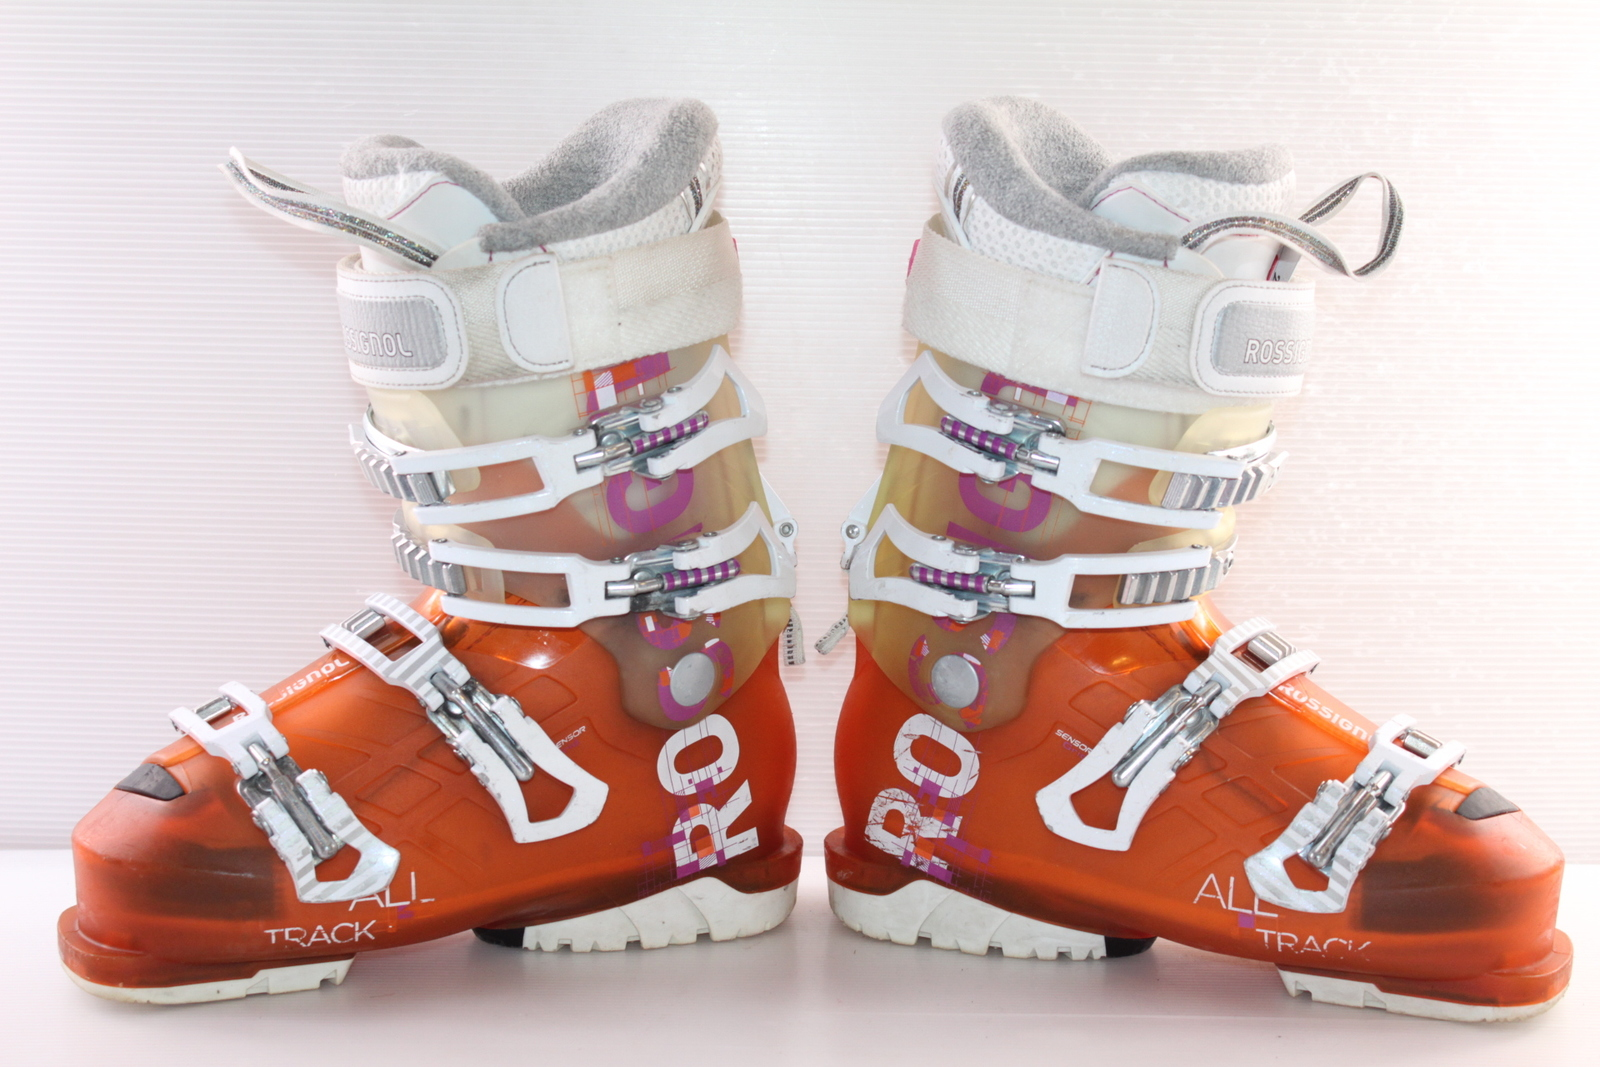 Dámské lyžáky Rossignol All Track vel. EU37